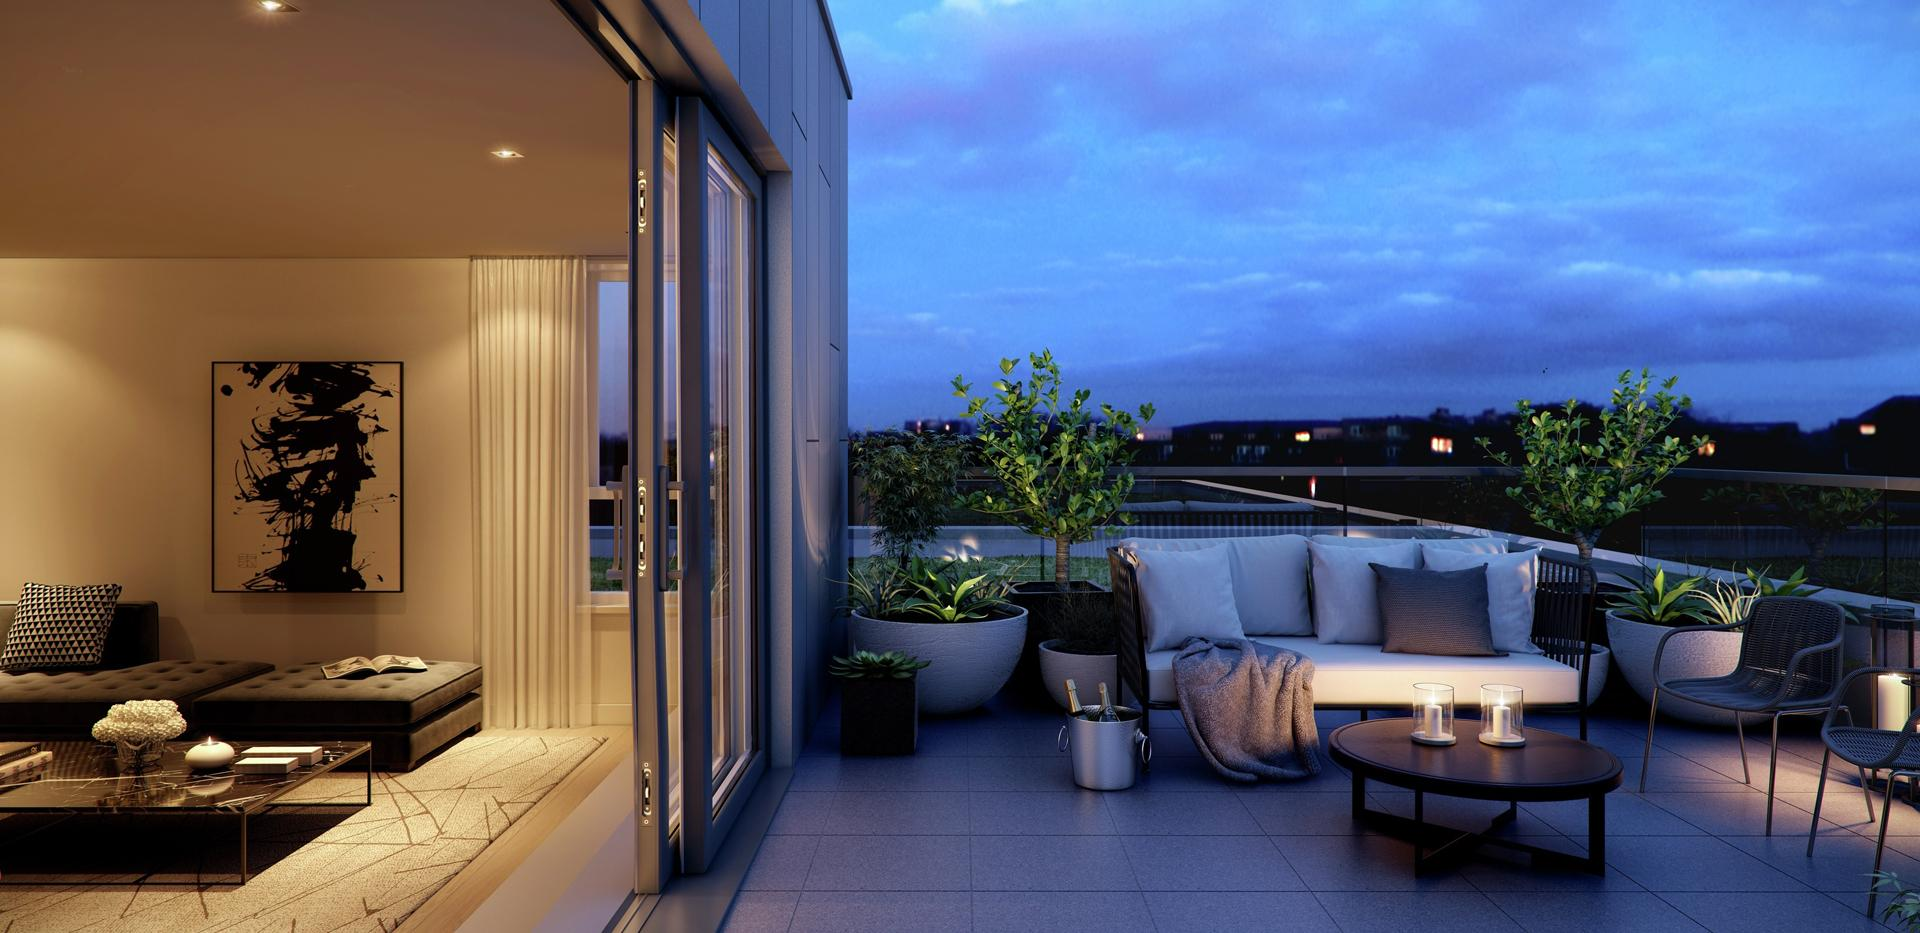 Berkeley, Brunswick Square, Living Room and Terrace